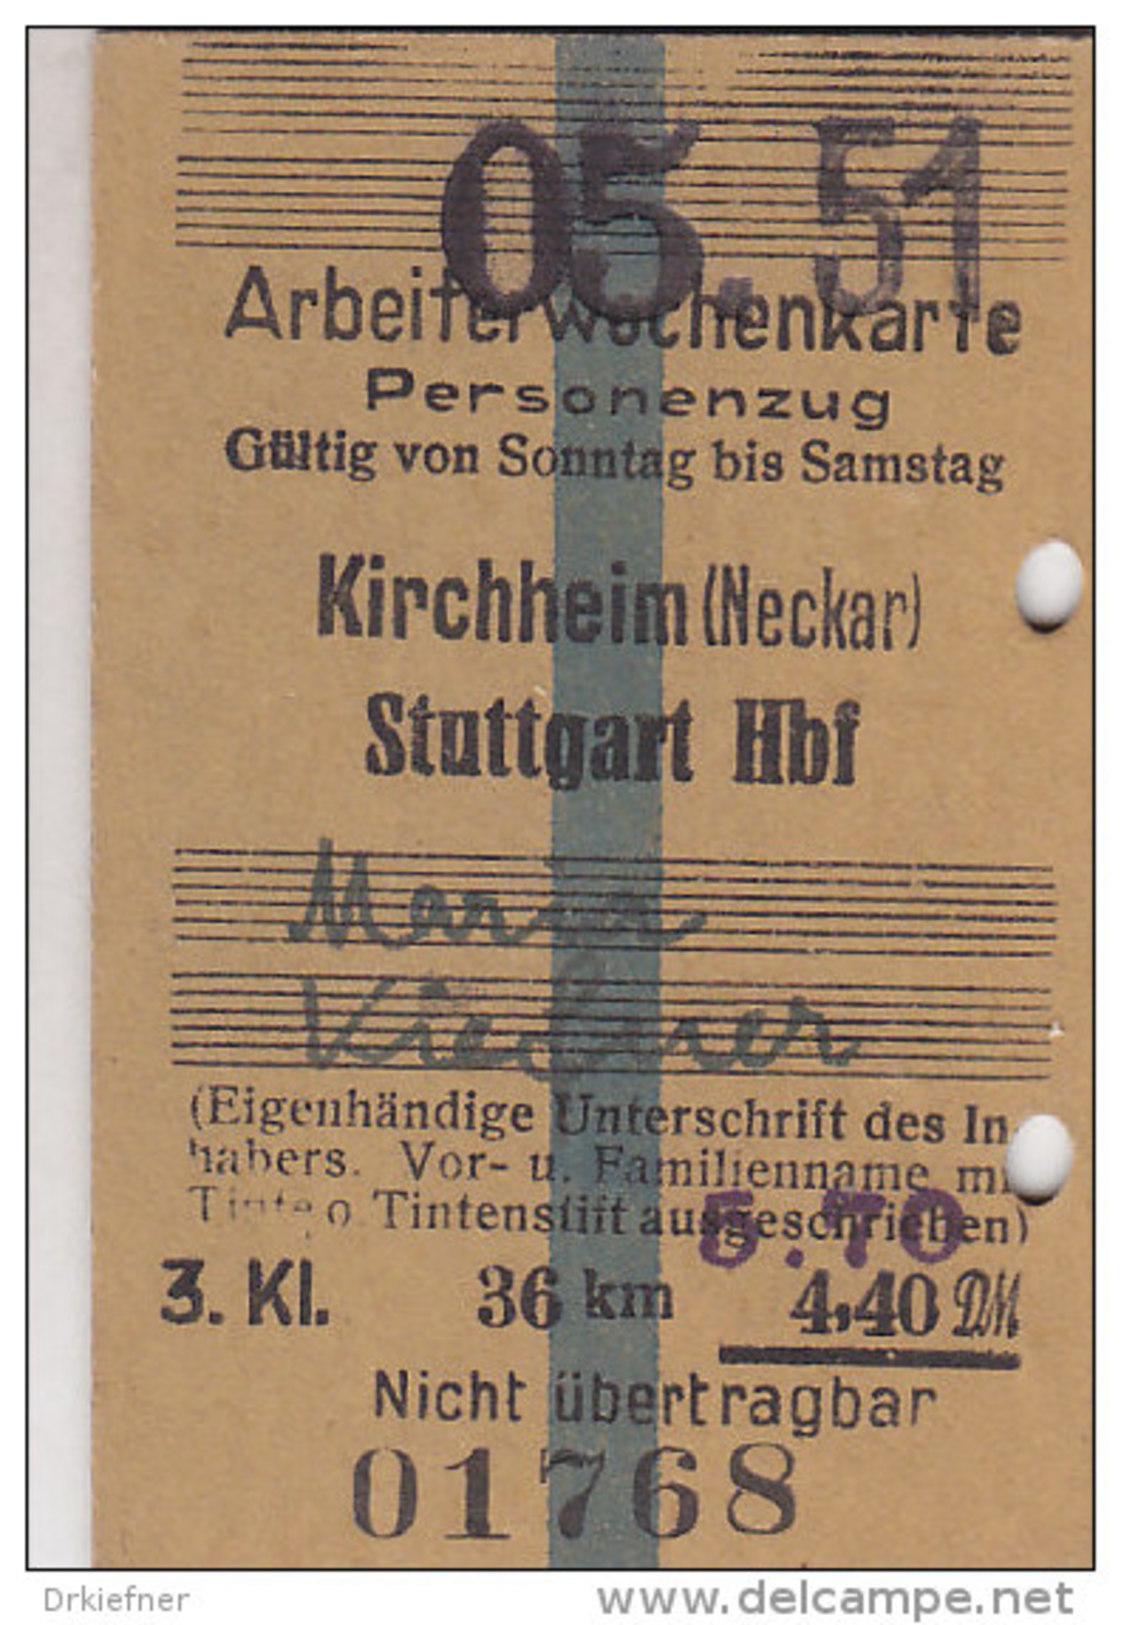 Fahrkarte, Ticket, Billet: EISENBAHN Arbeiterwochenkarte Kirchheim (Neckar) - Stuttgart 1951, So. Bis Sa.,3. Kl. 5,70 DM - Wochen- U. Monatsausweise